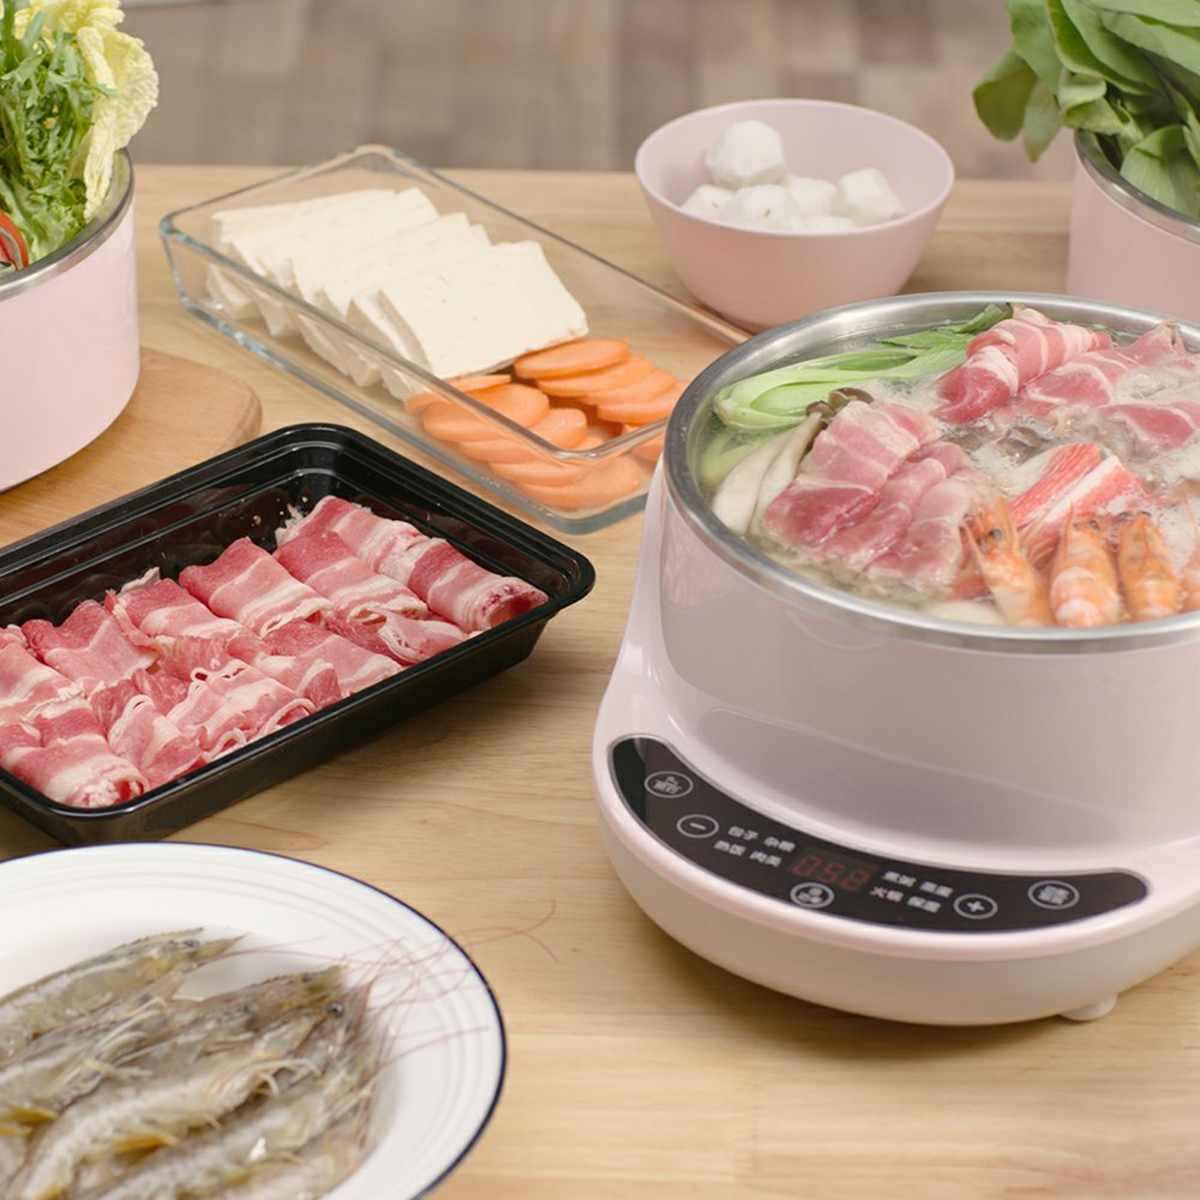 600 W 3 Lapisan Food Steamer Hot Pot Stainless Steel Soup Bubur Pot Sayuran Daging Pemanasan Cooker Alat Dapur 4L